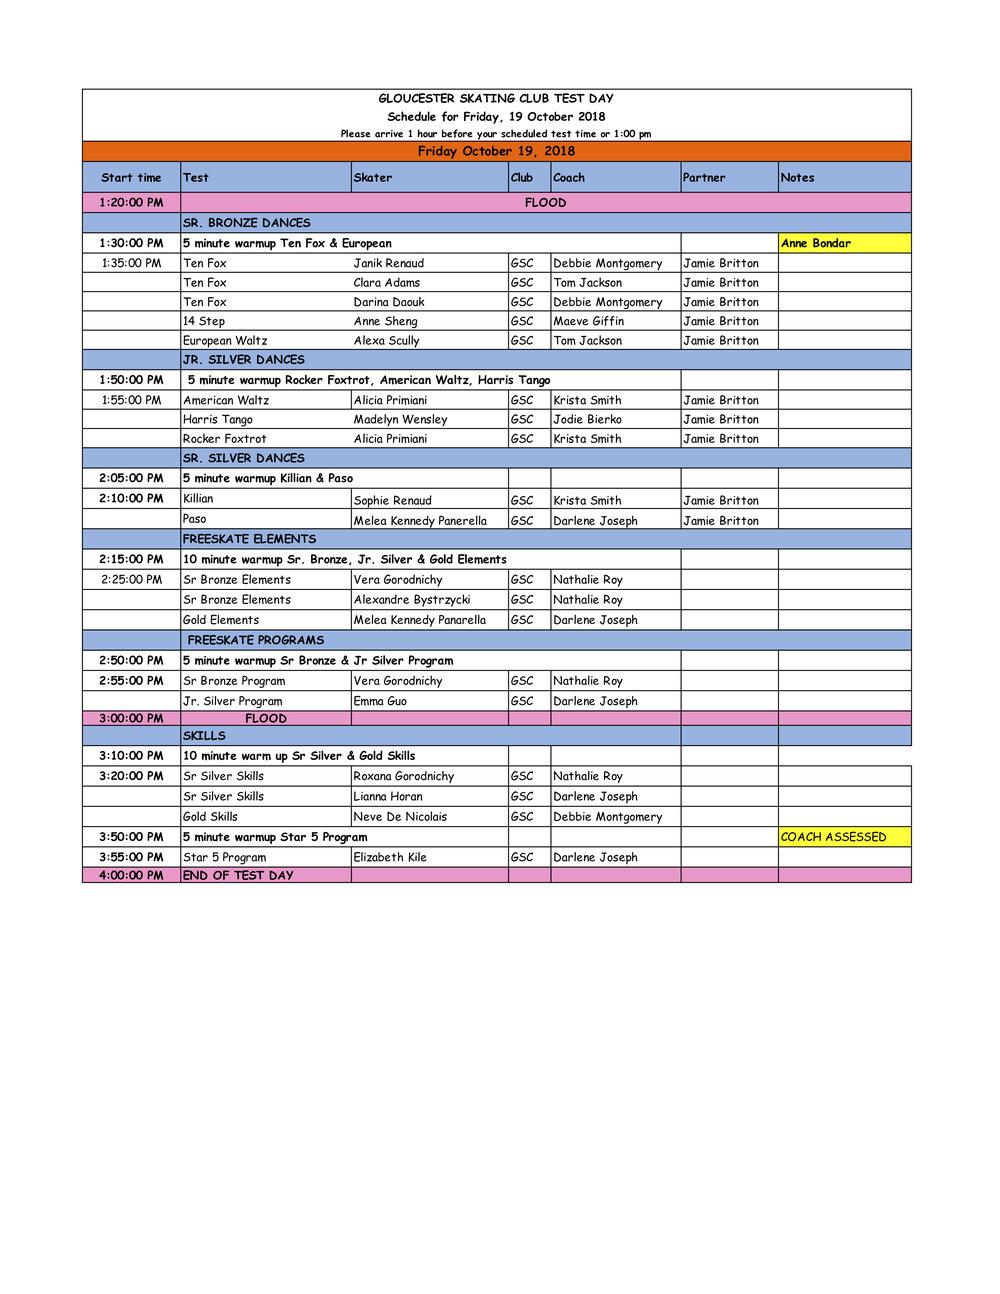 Gloucester October 19 Test Day Schedule.jpg